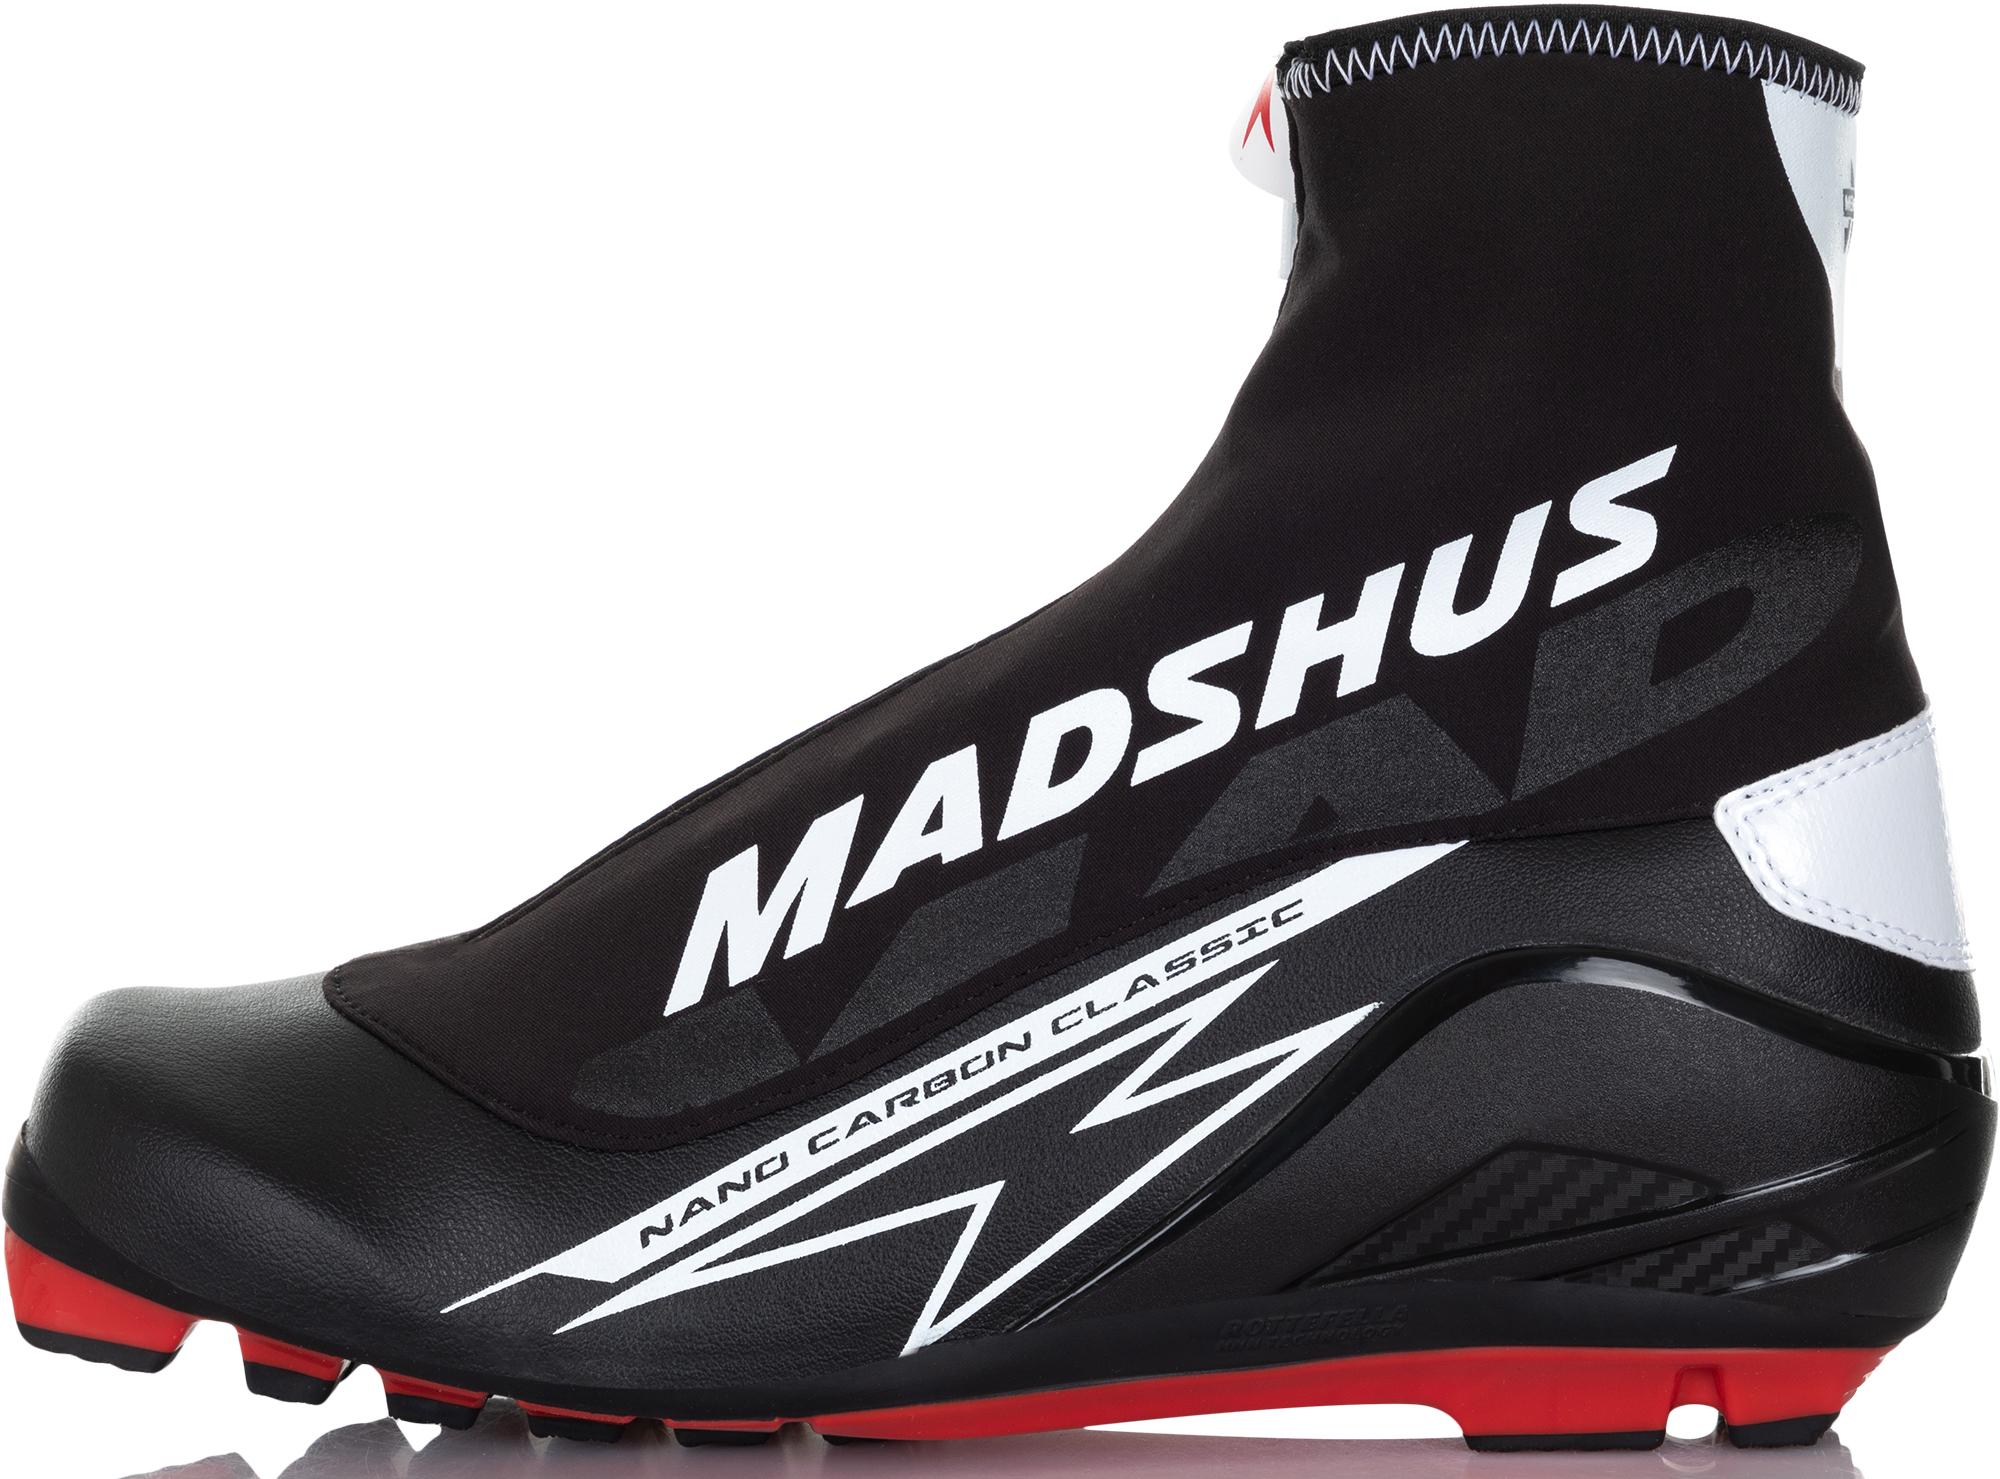 Madshus Ботинки для беговых лыж Madshus NANO CARBON CLASSIC цена